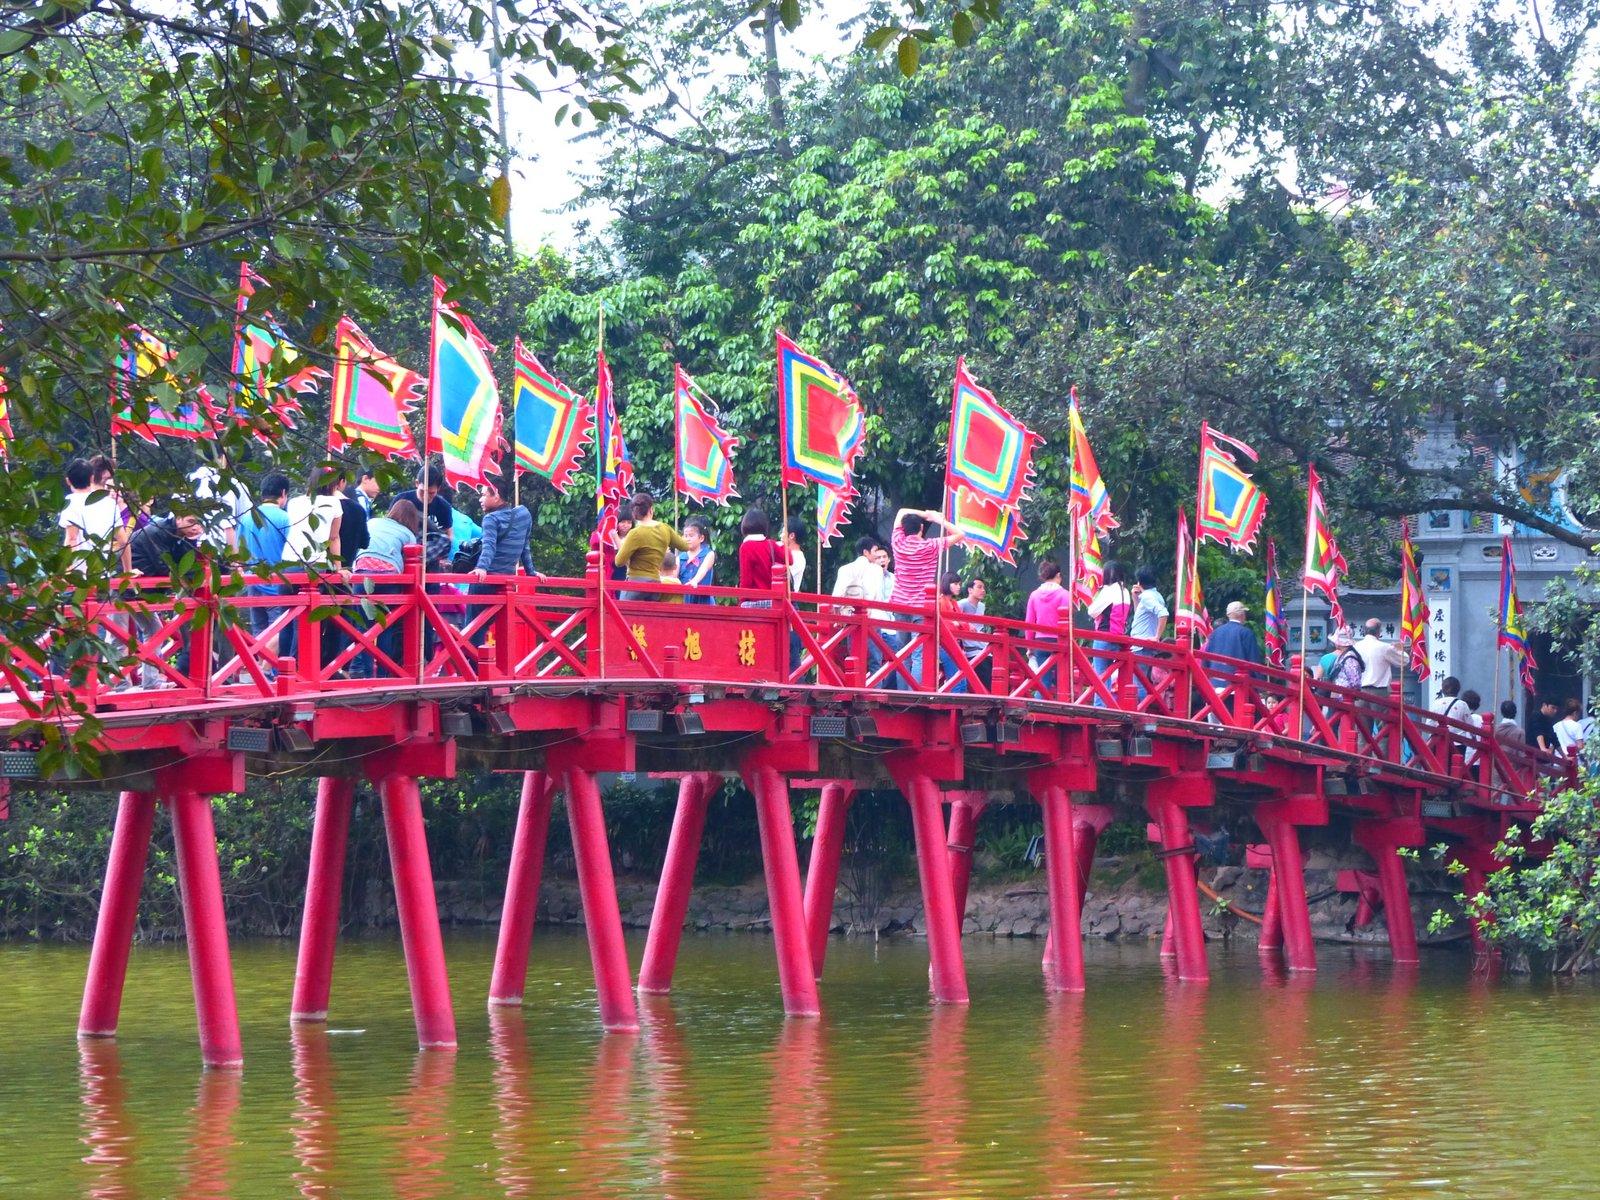 The Huc Bridge, leading across Hoan Kiem Lake to Ngoc Son Temple on Jade Island.